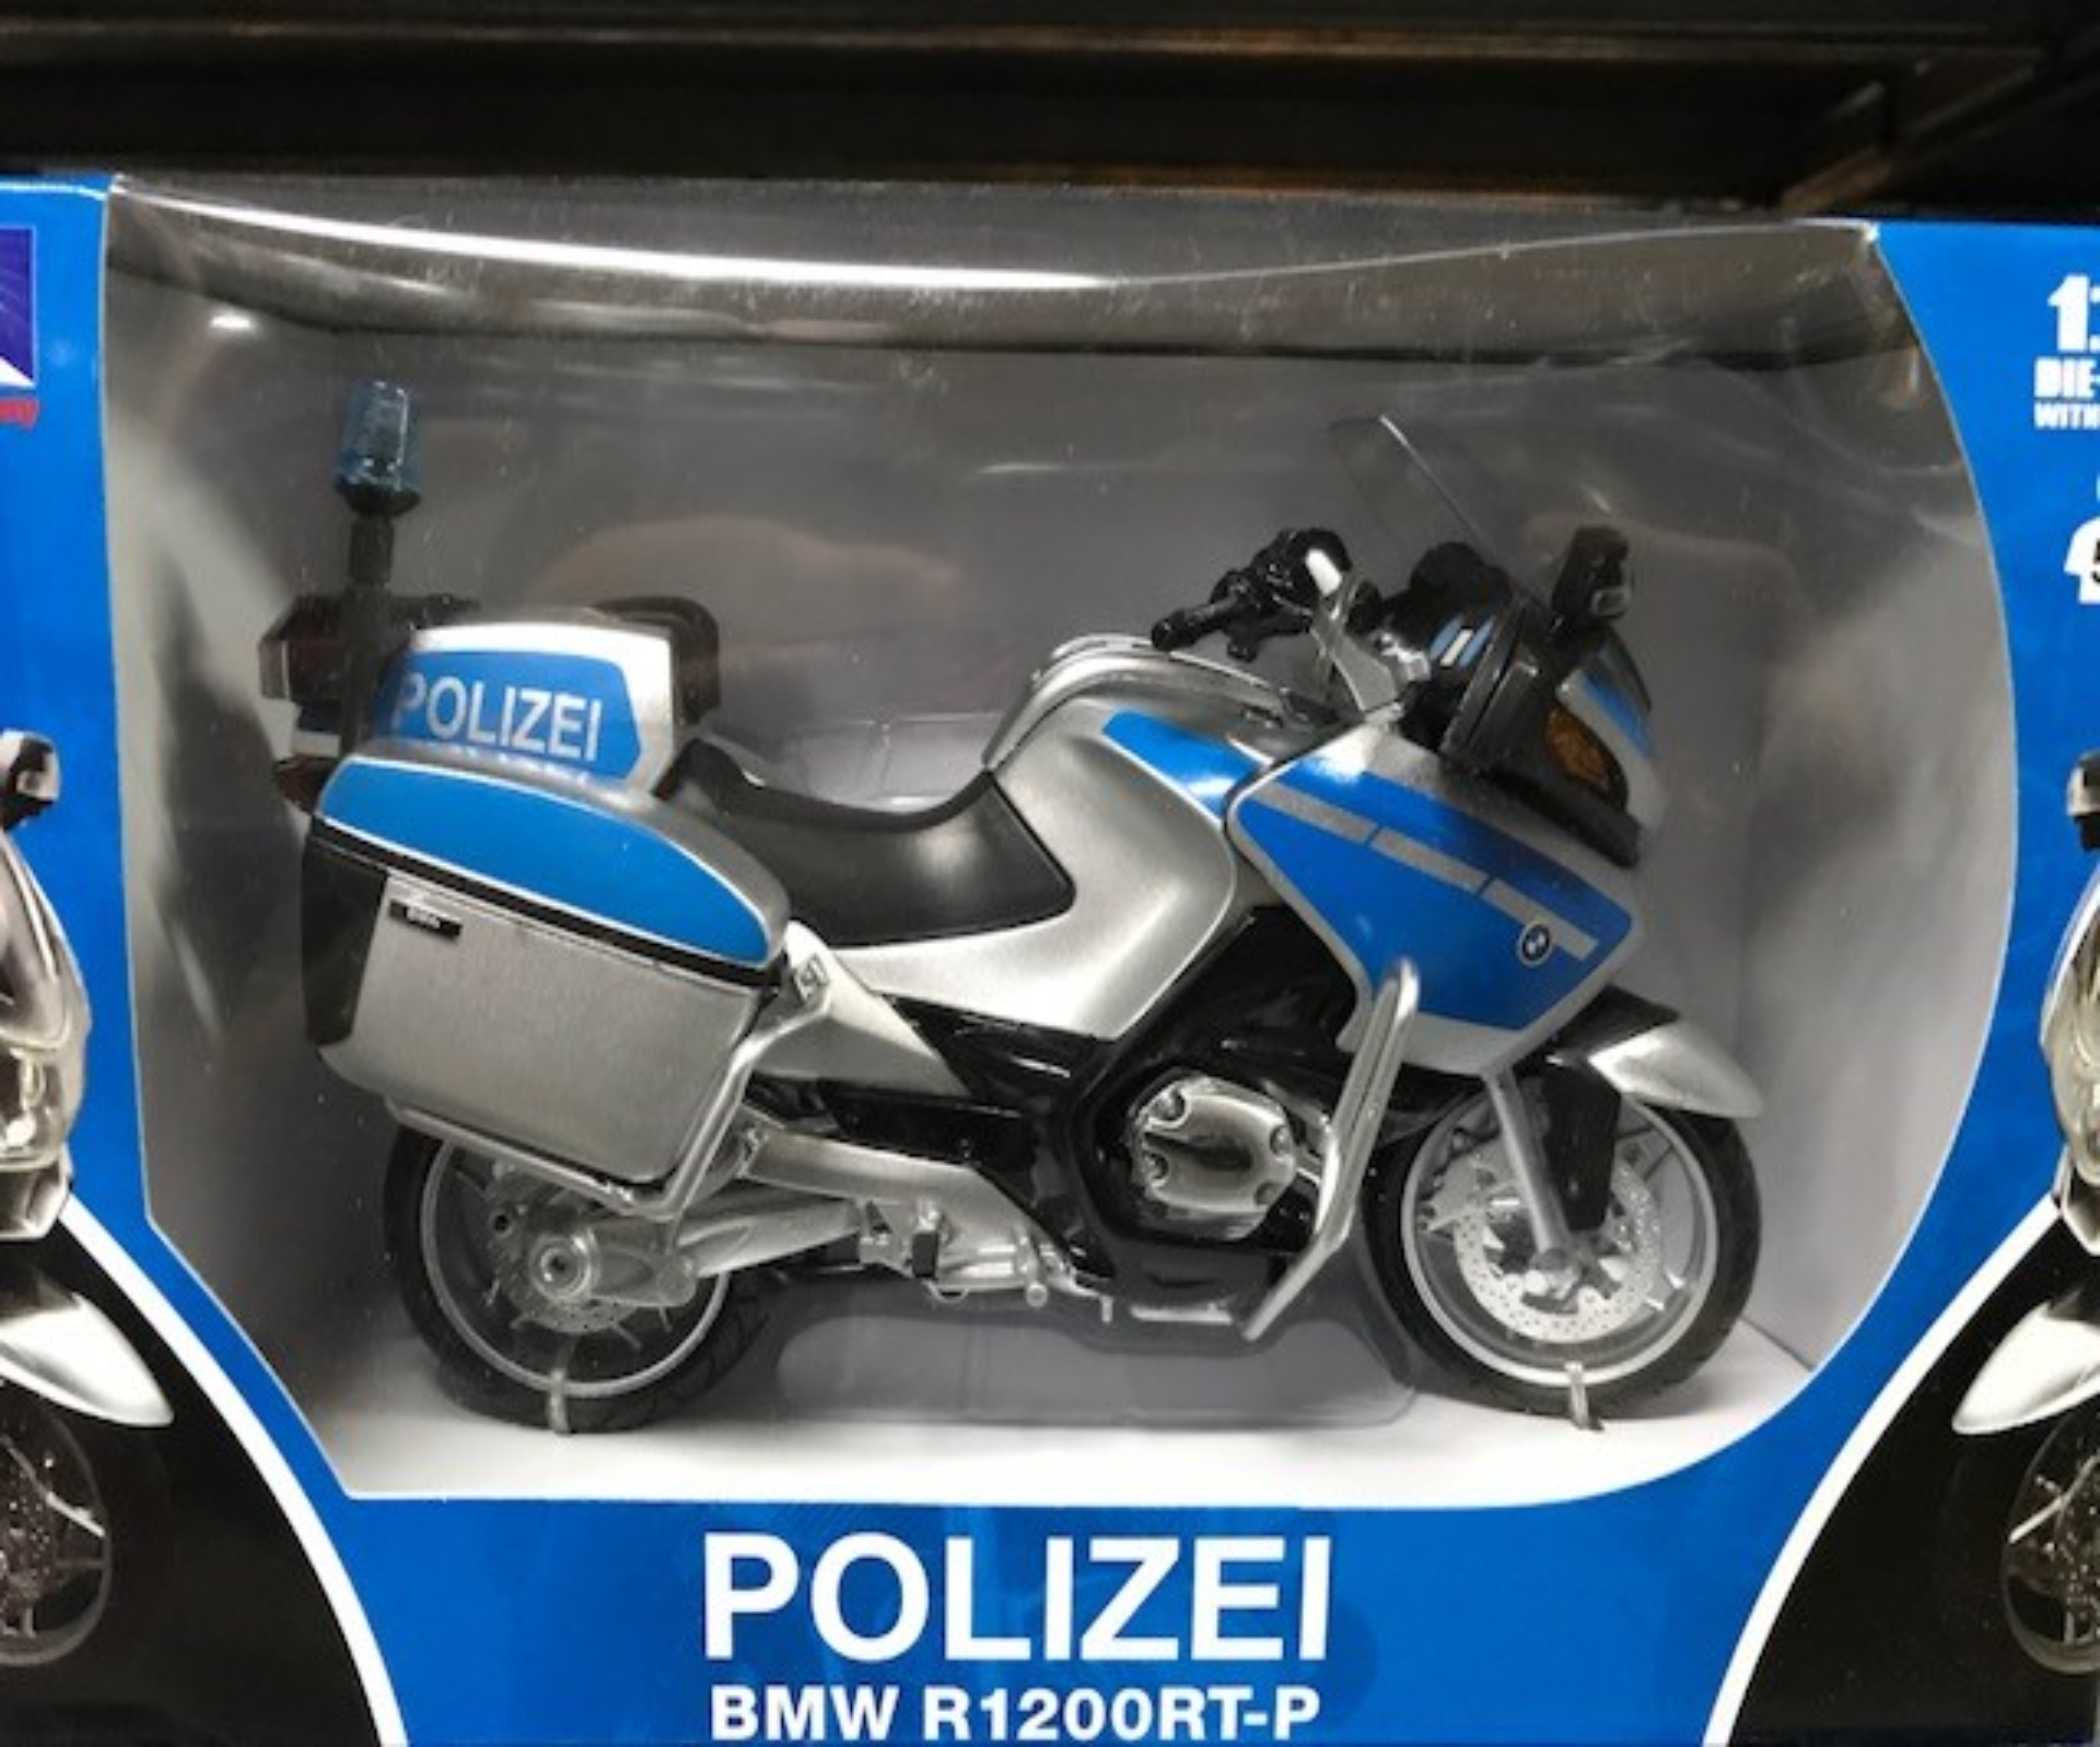 Bmw R1200 Rt P Polizei 1 12 F1 World Com Diecast Scale Models